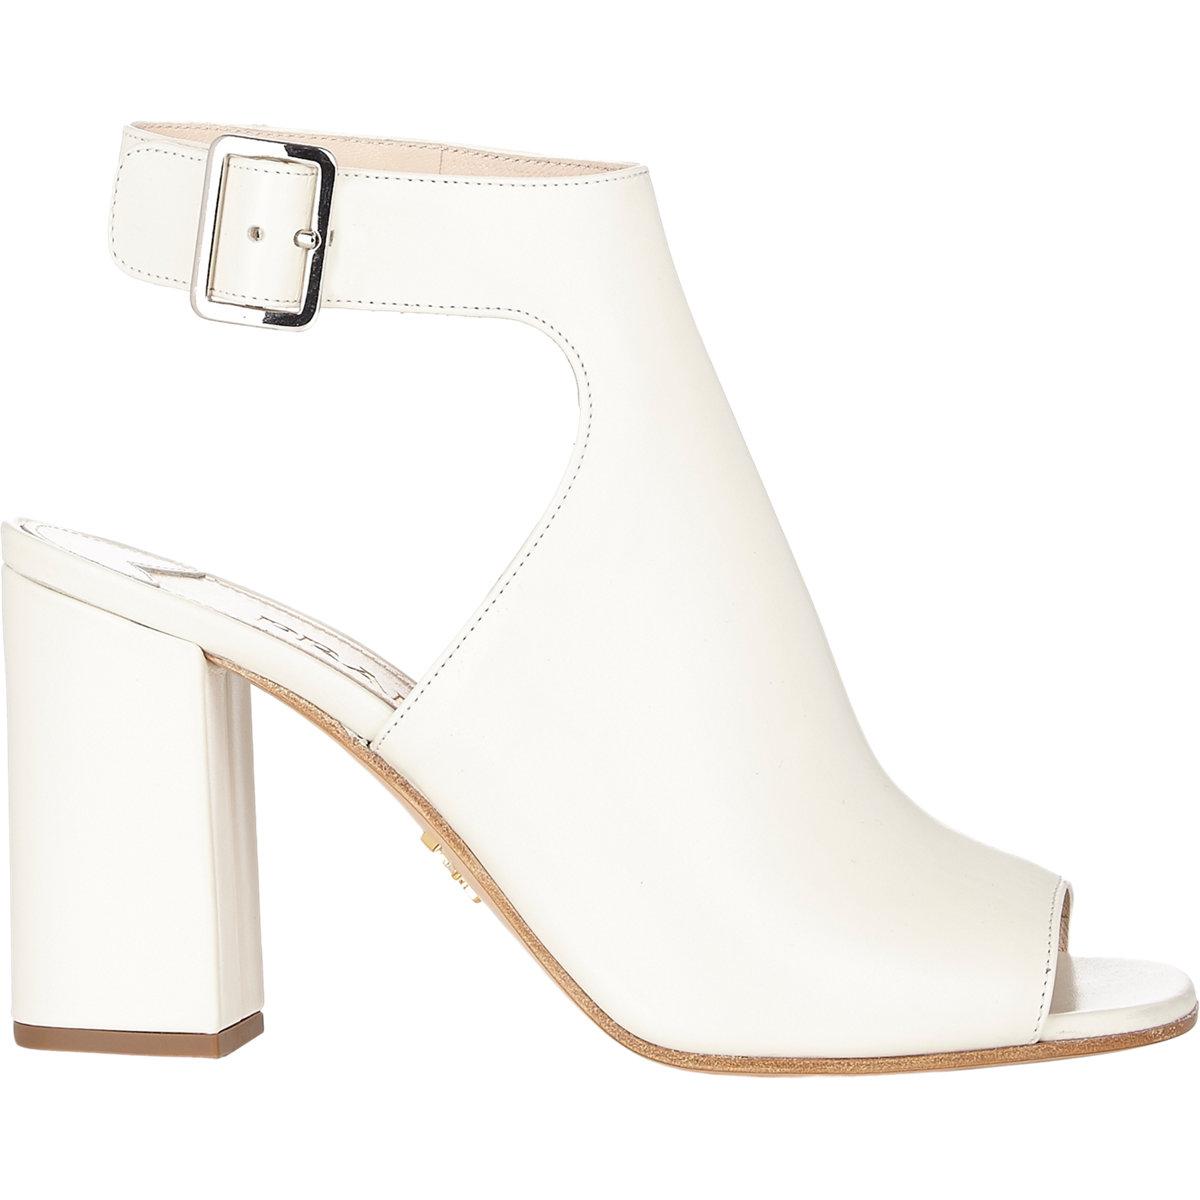 prada chunky heel halter sandals white size 6 5 in